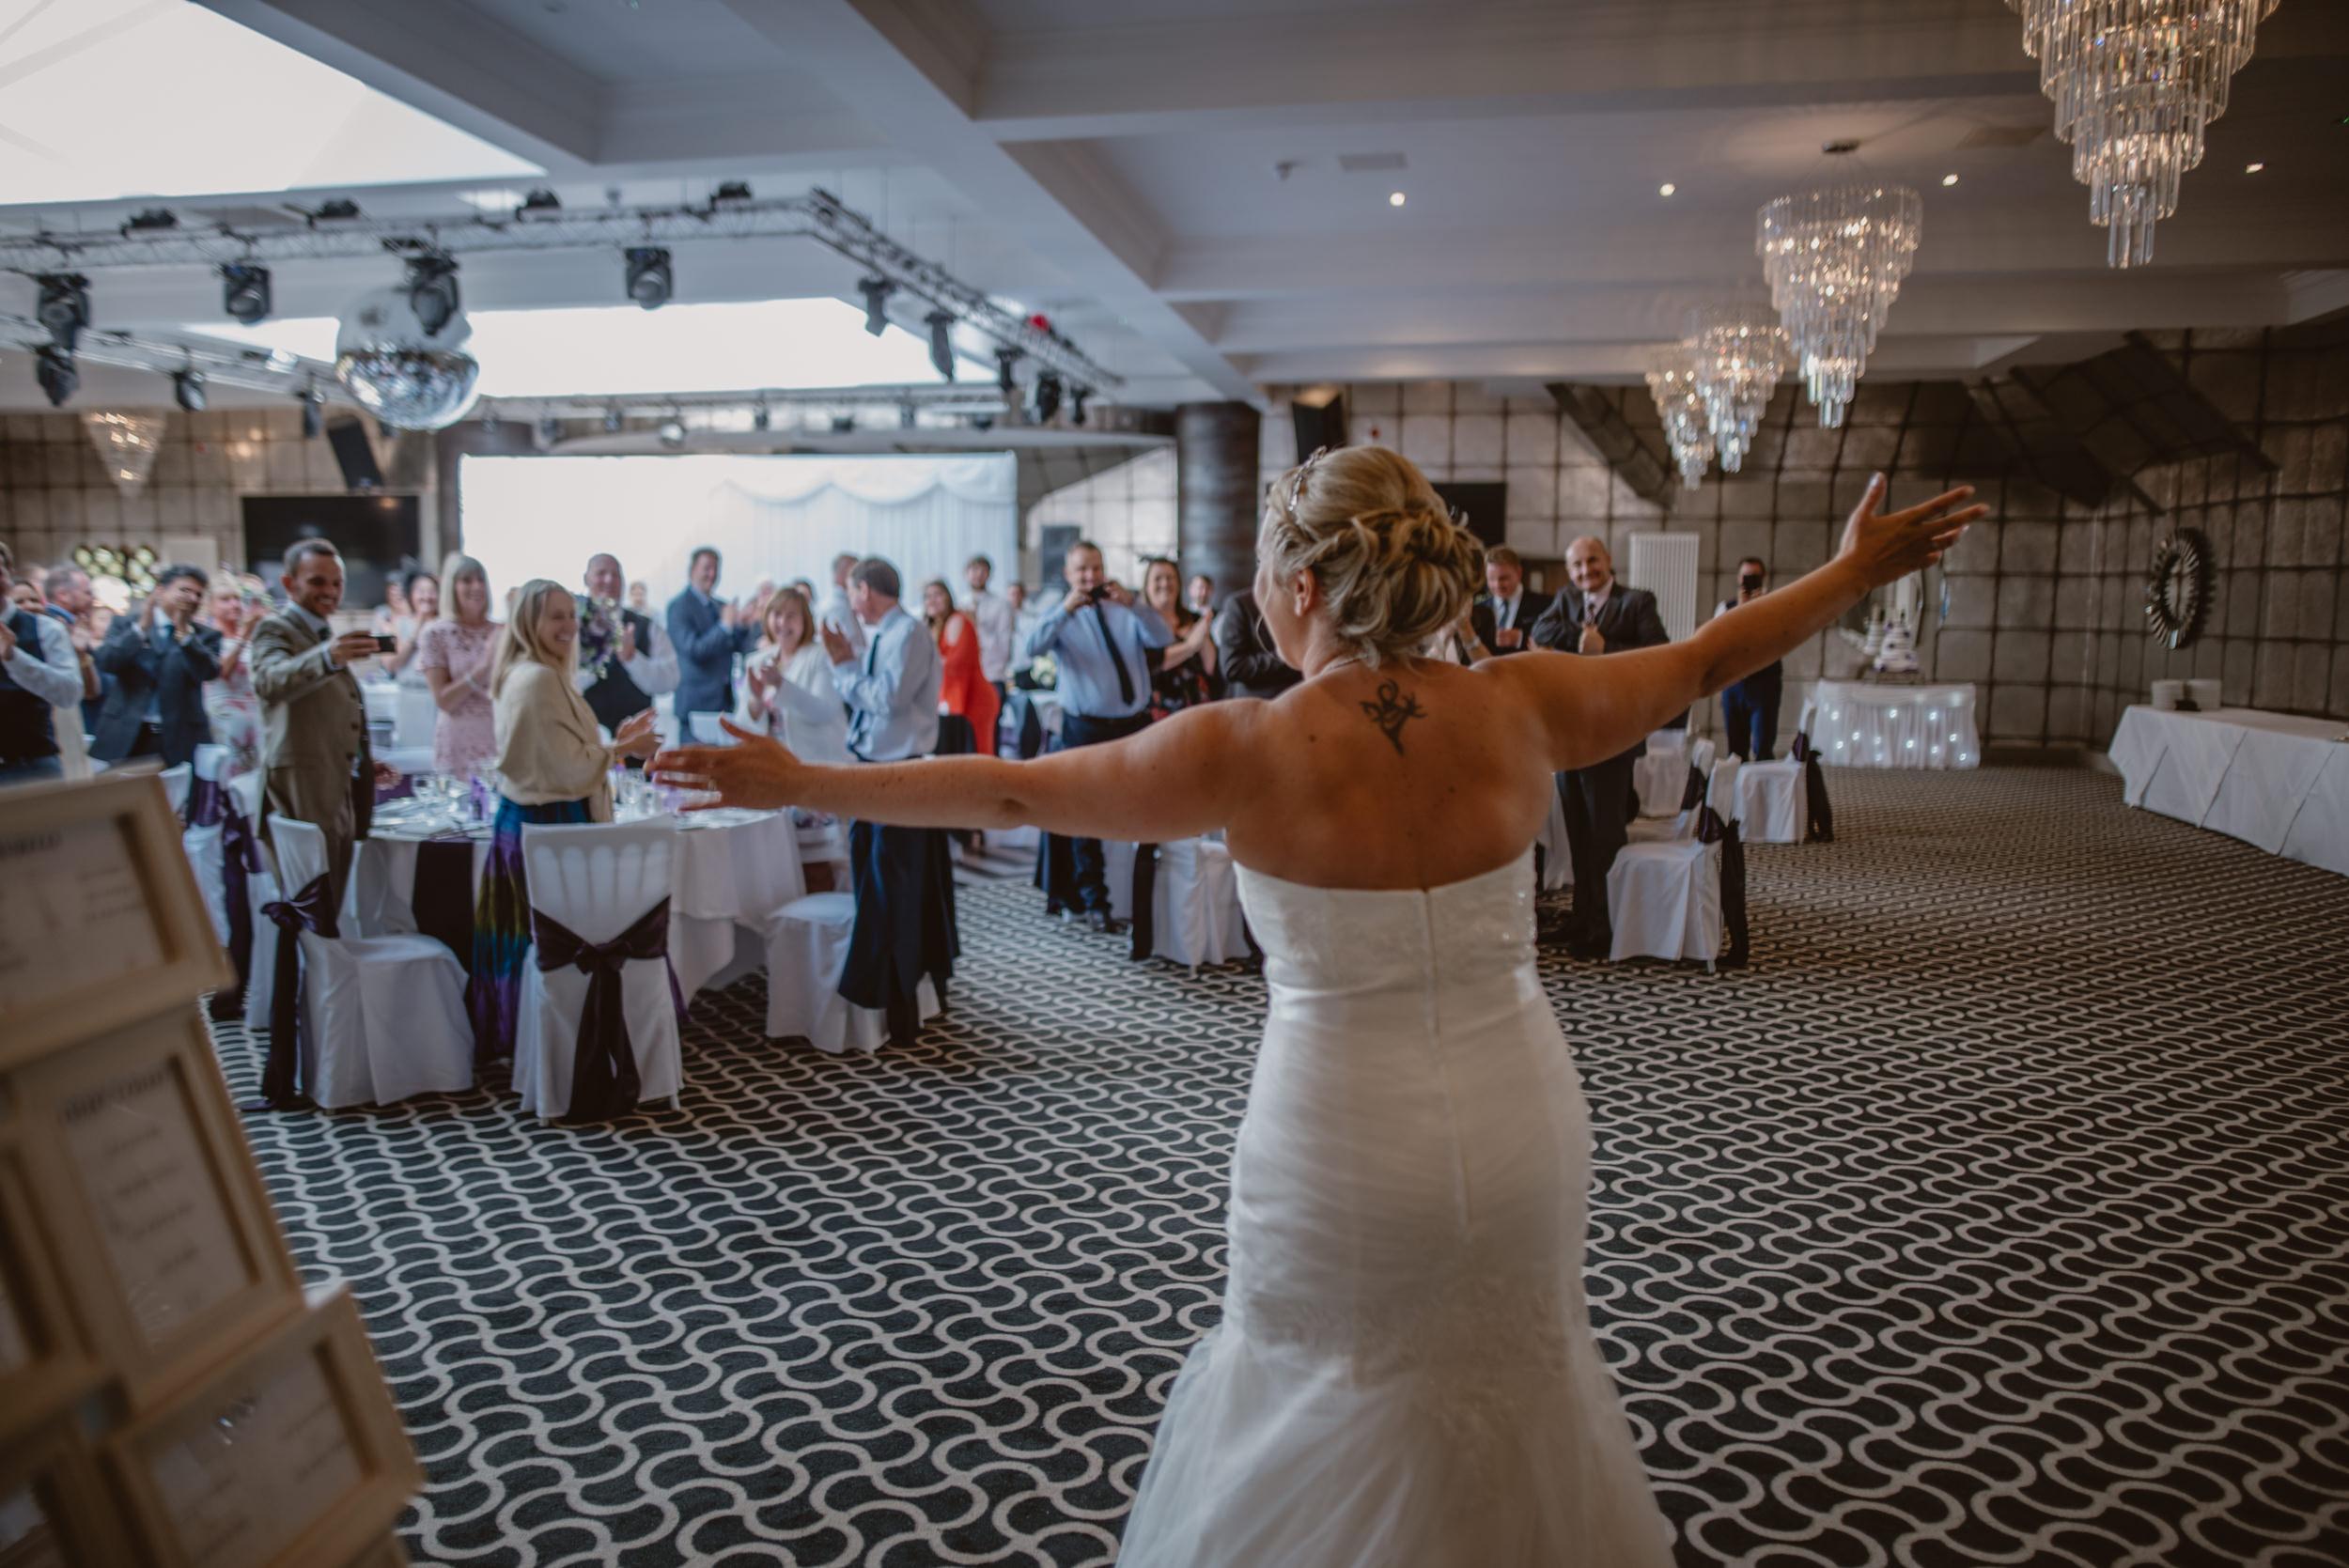 Chantelle-and-Stephen-Old-Thorns-Hotel-Wedding-Liphook-Manu-Mendoza-Wedding-Photography-343.jpg